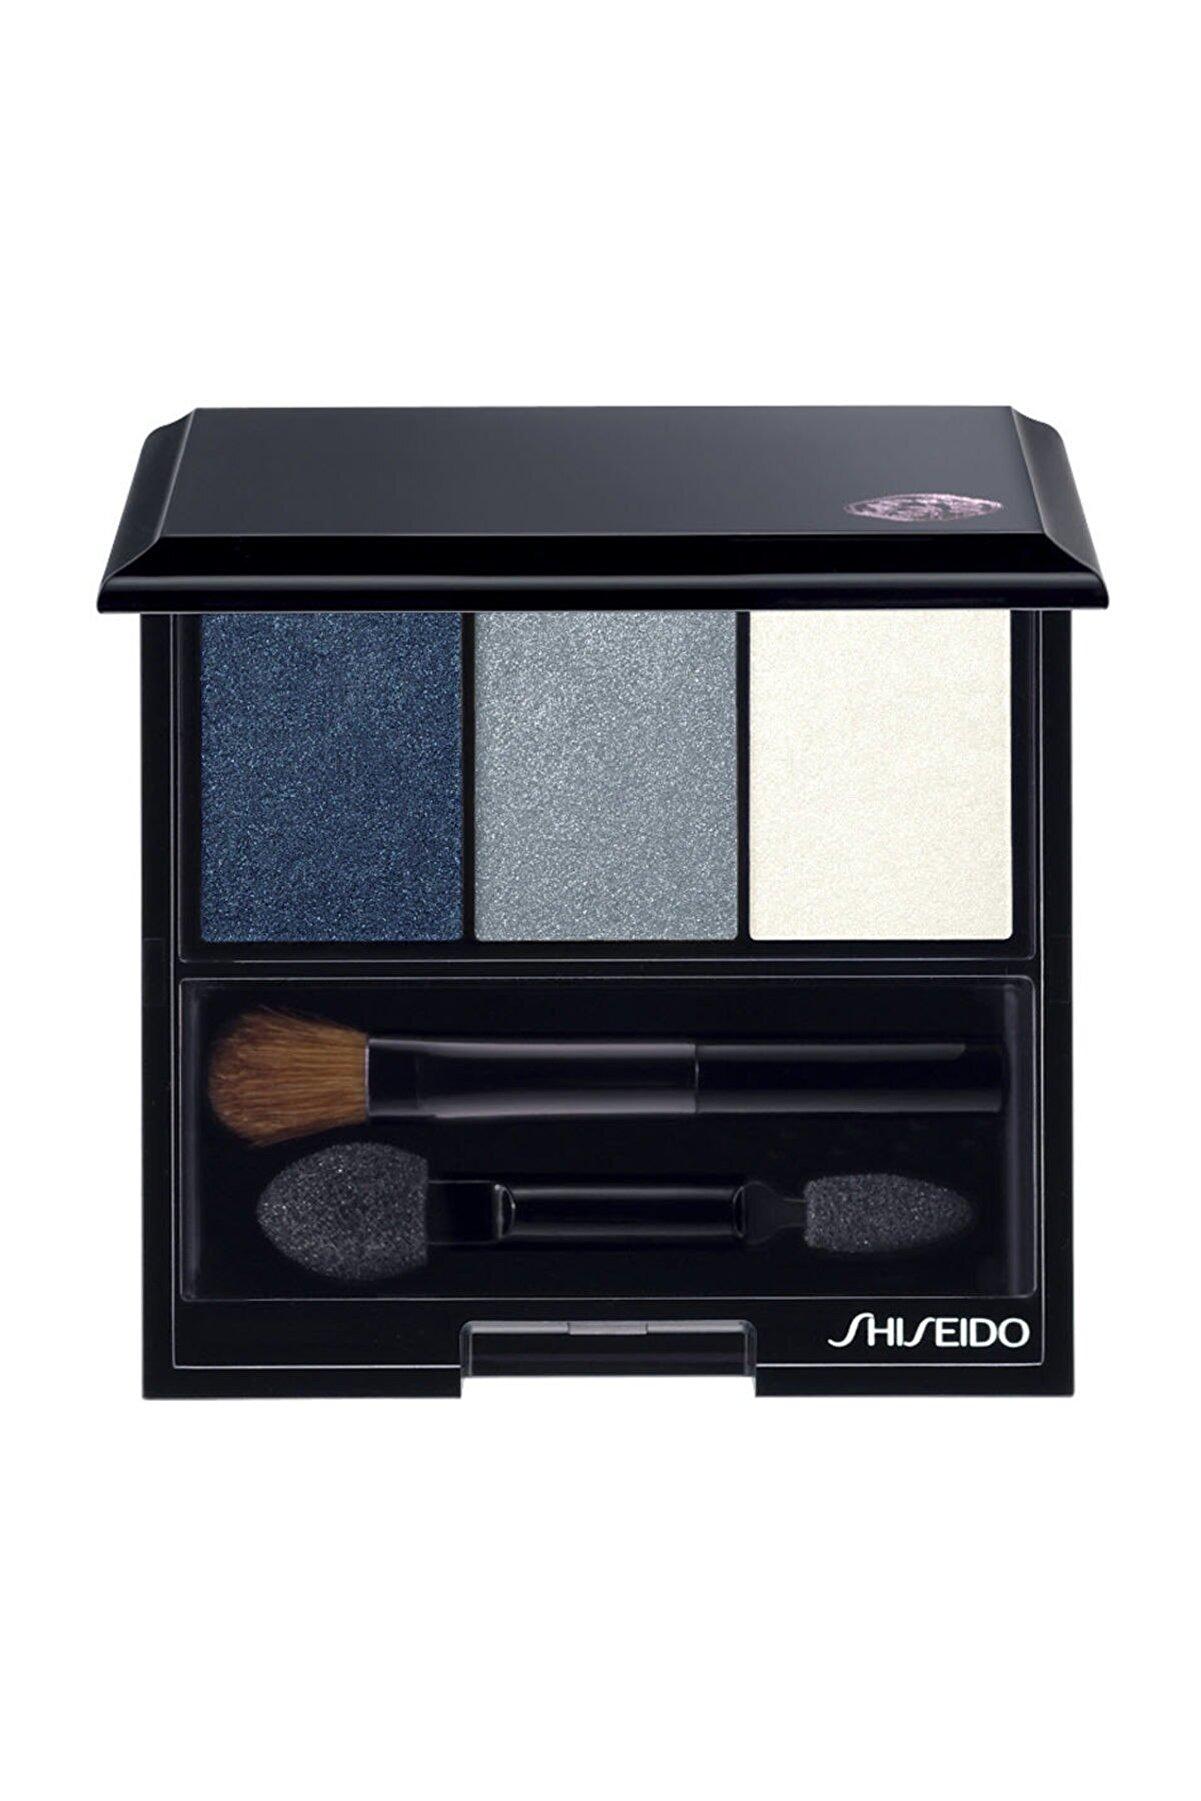 Shiseido Saten bitişli 3'lü Göz Farı - Luminizing Satin Eye Color Trio GY901  729238105218